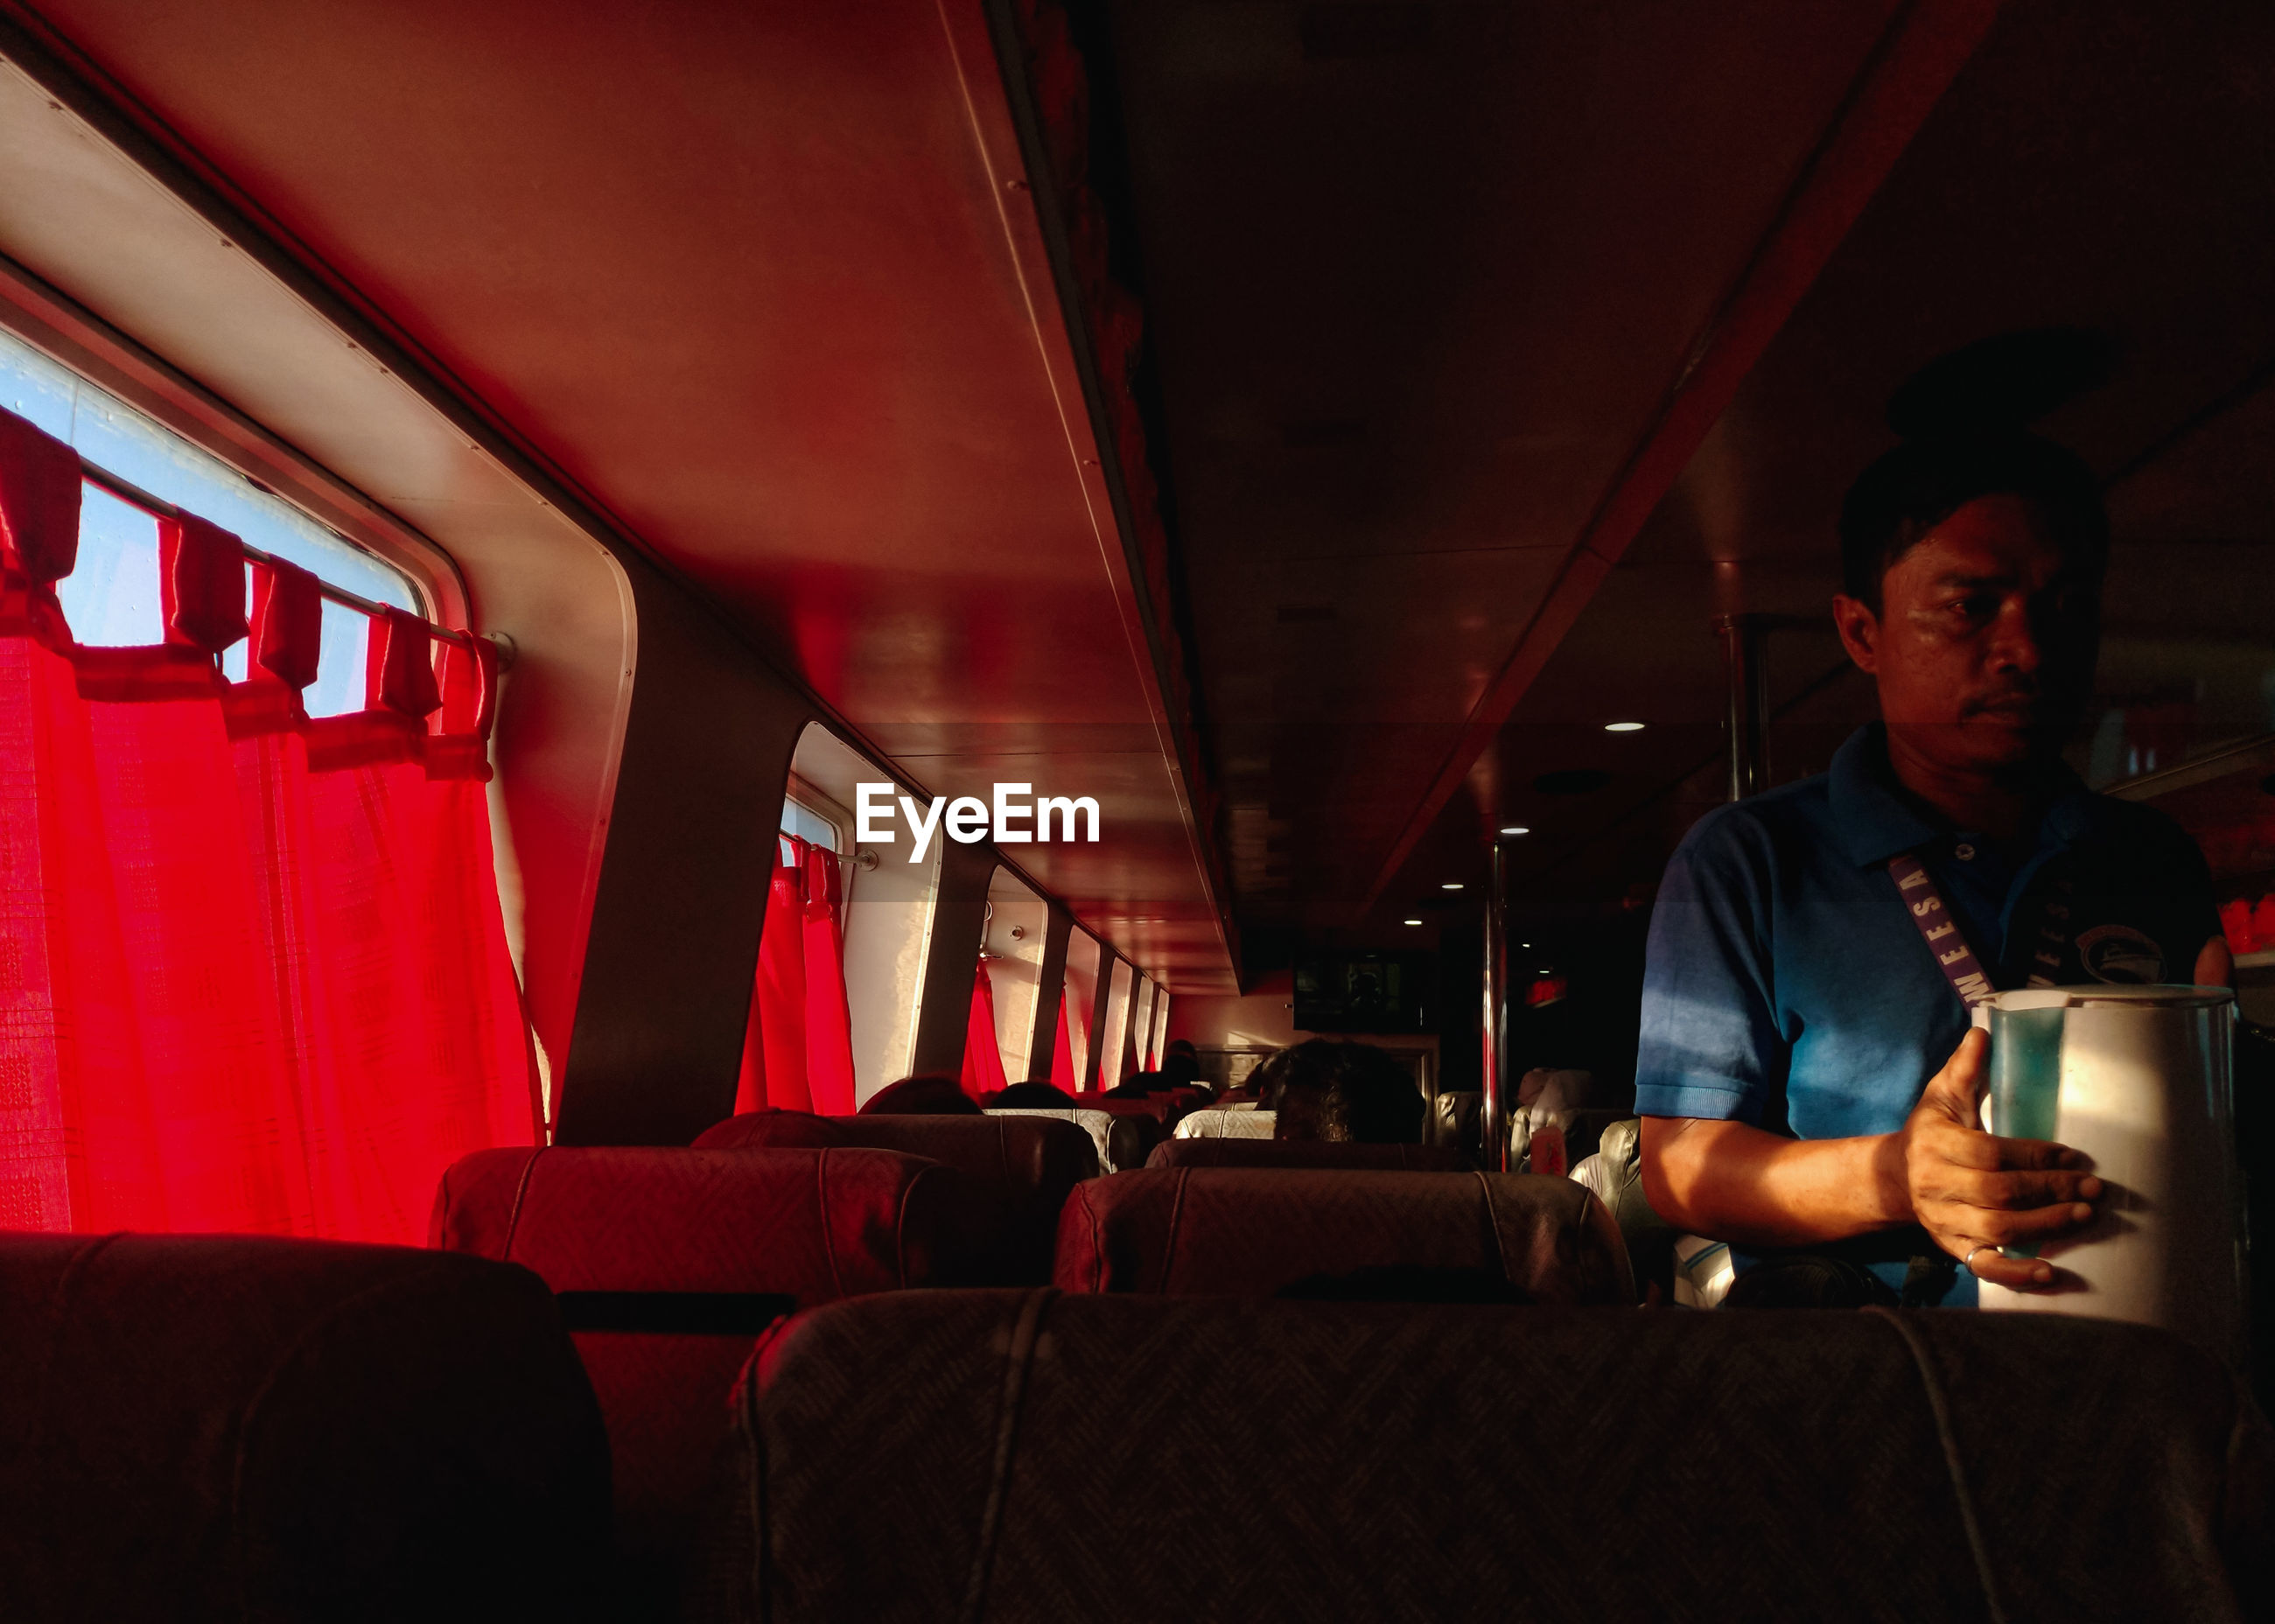 MAN SITTING ON SEAT IN BUS